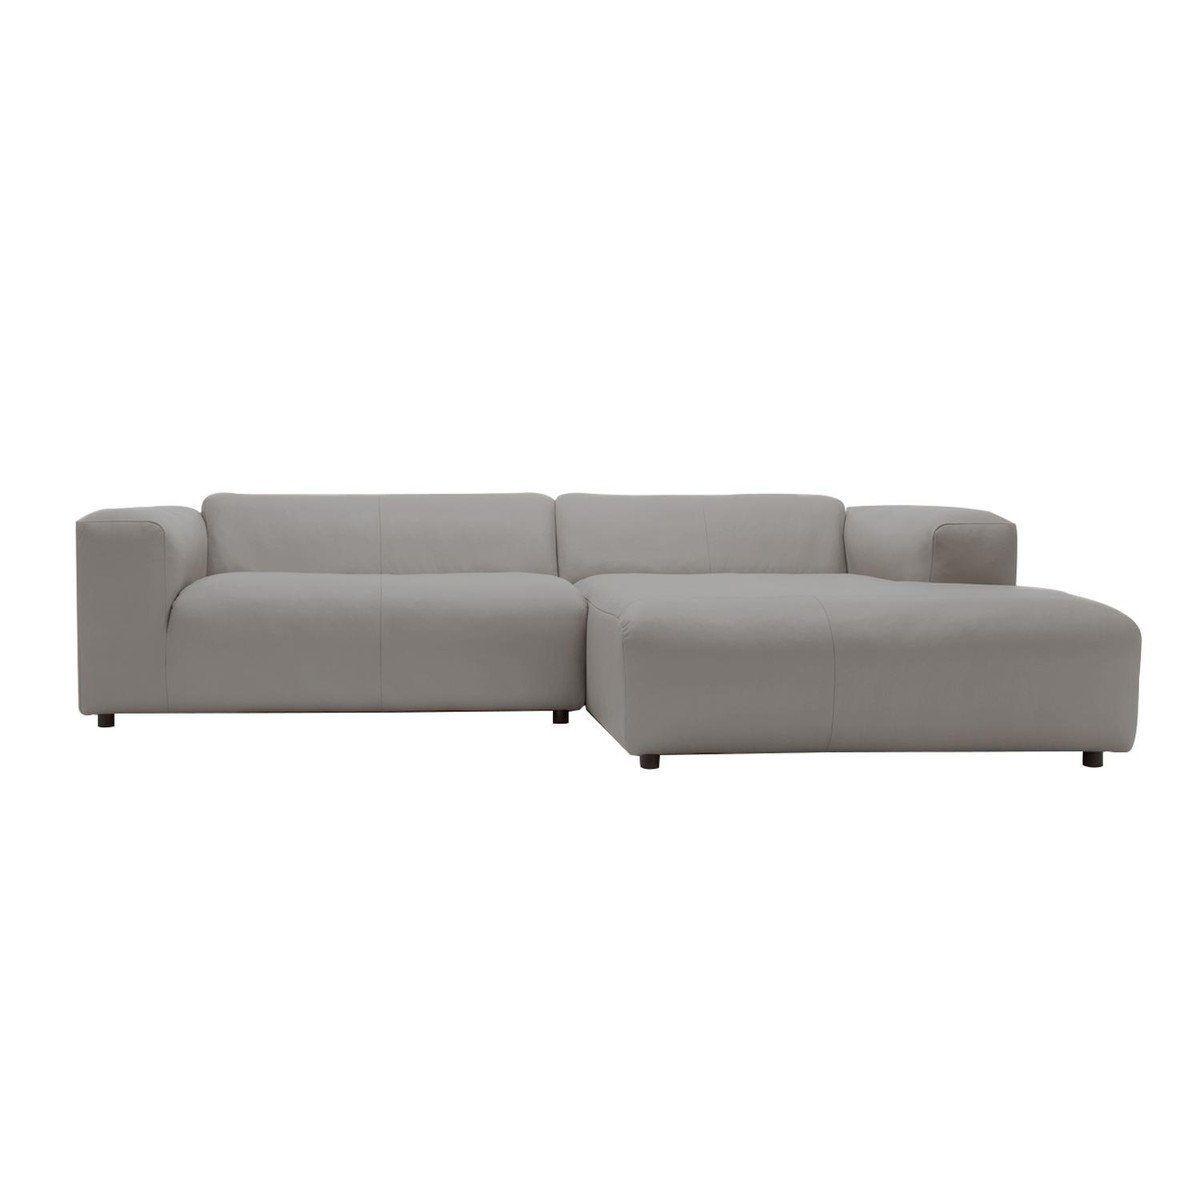 freistil 187 Lounge Sofa 260x185cm | freistil Rolf Benz ...